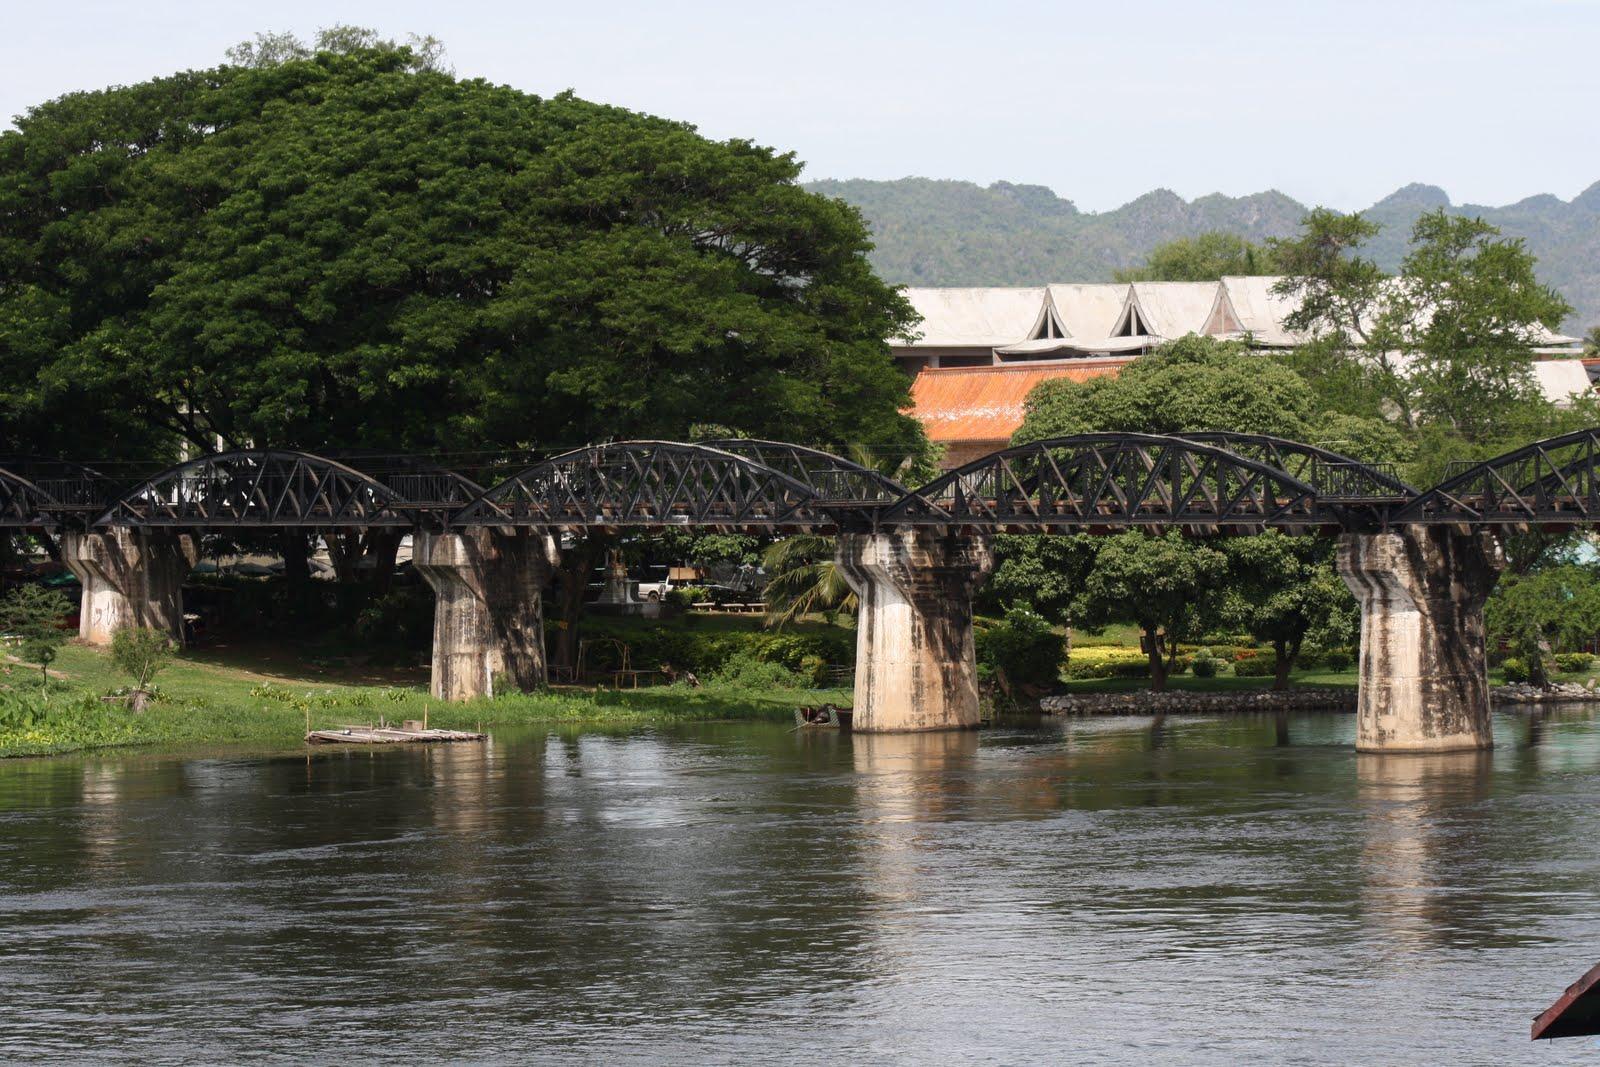 bridge on the river - photo #3